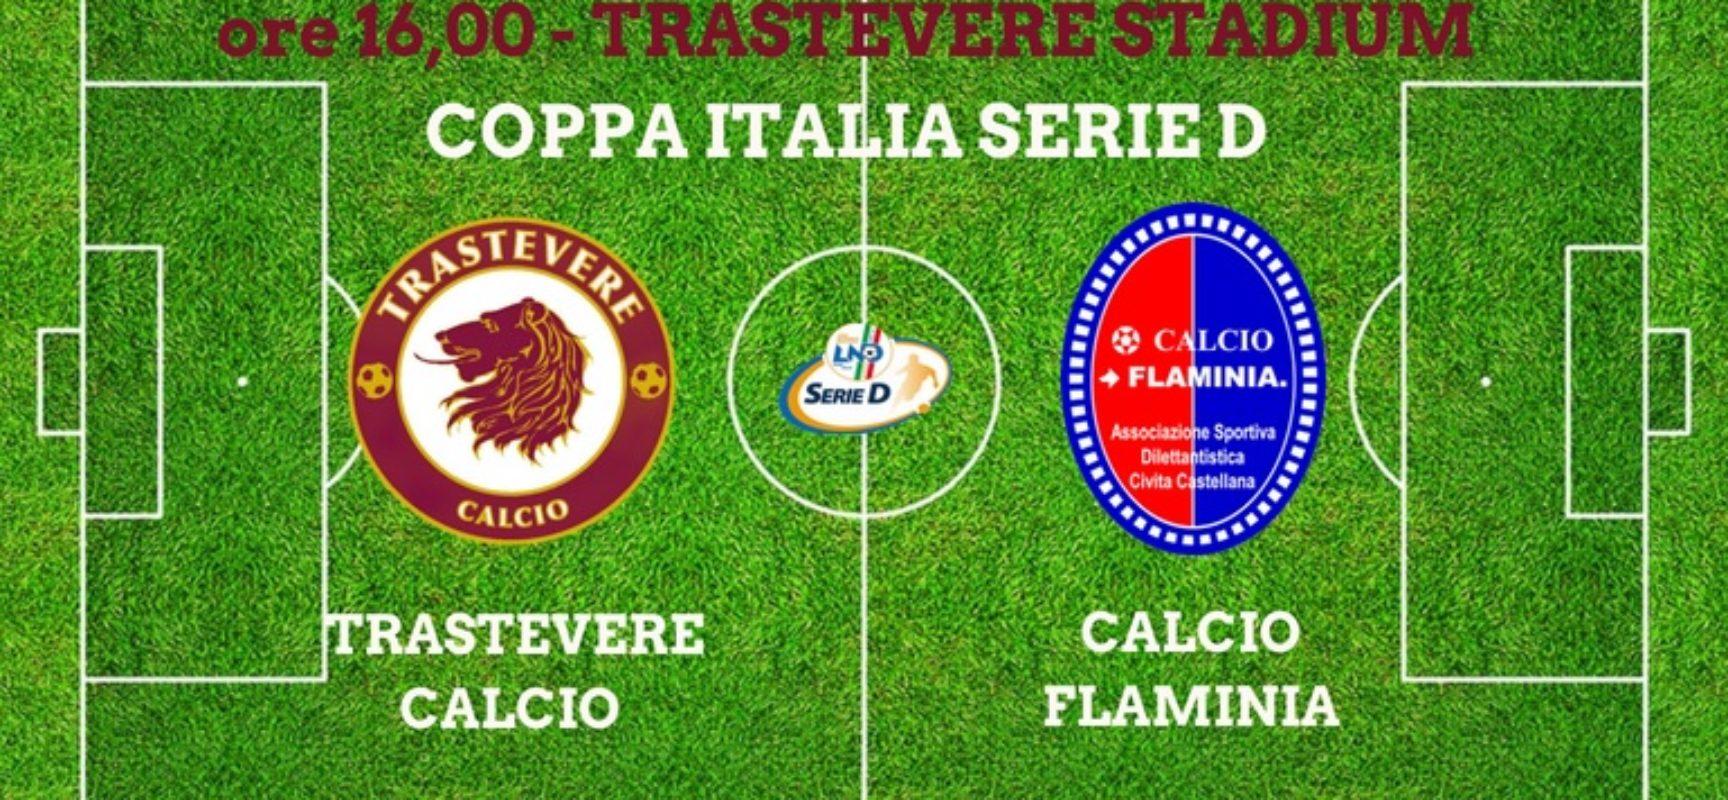 Coppa Italia Serie D, Trastevere-Flaminia posticipata alle ore 16